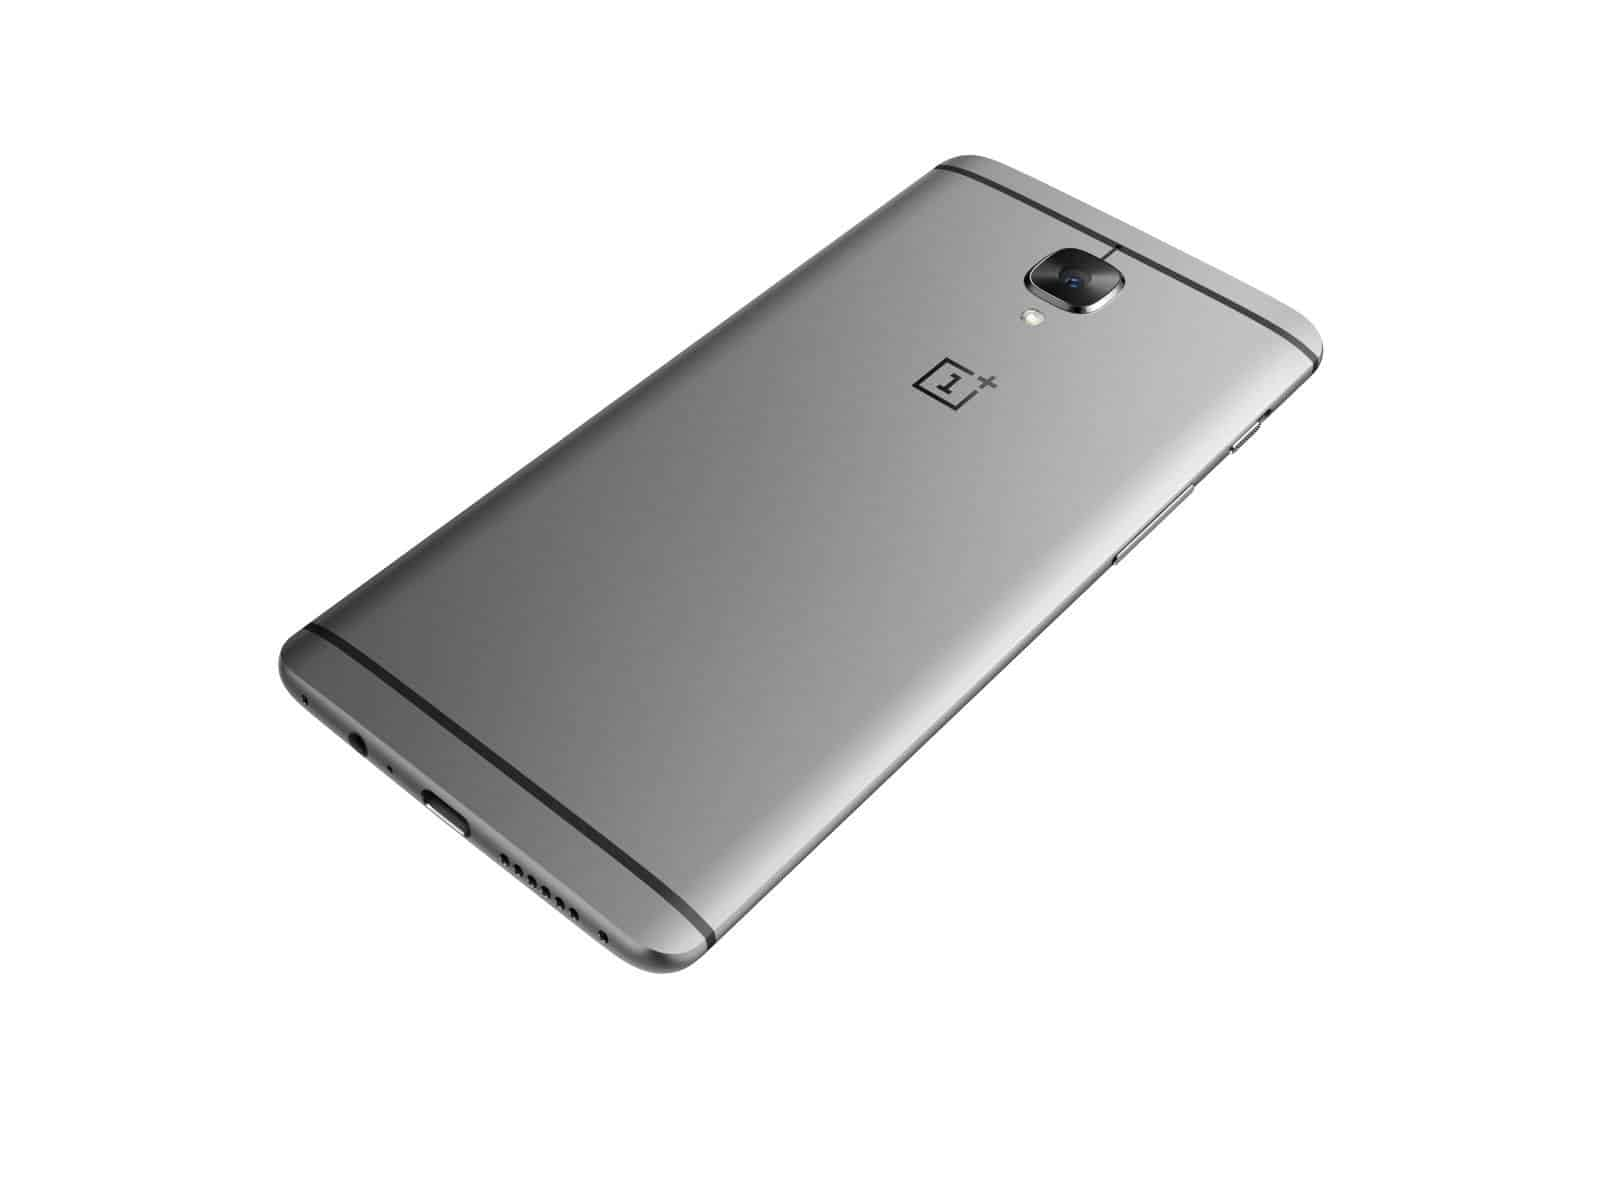 OnePlus 3 Graphite Press AH 16